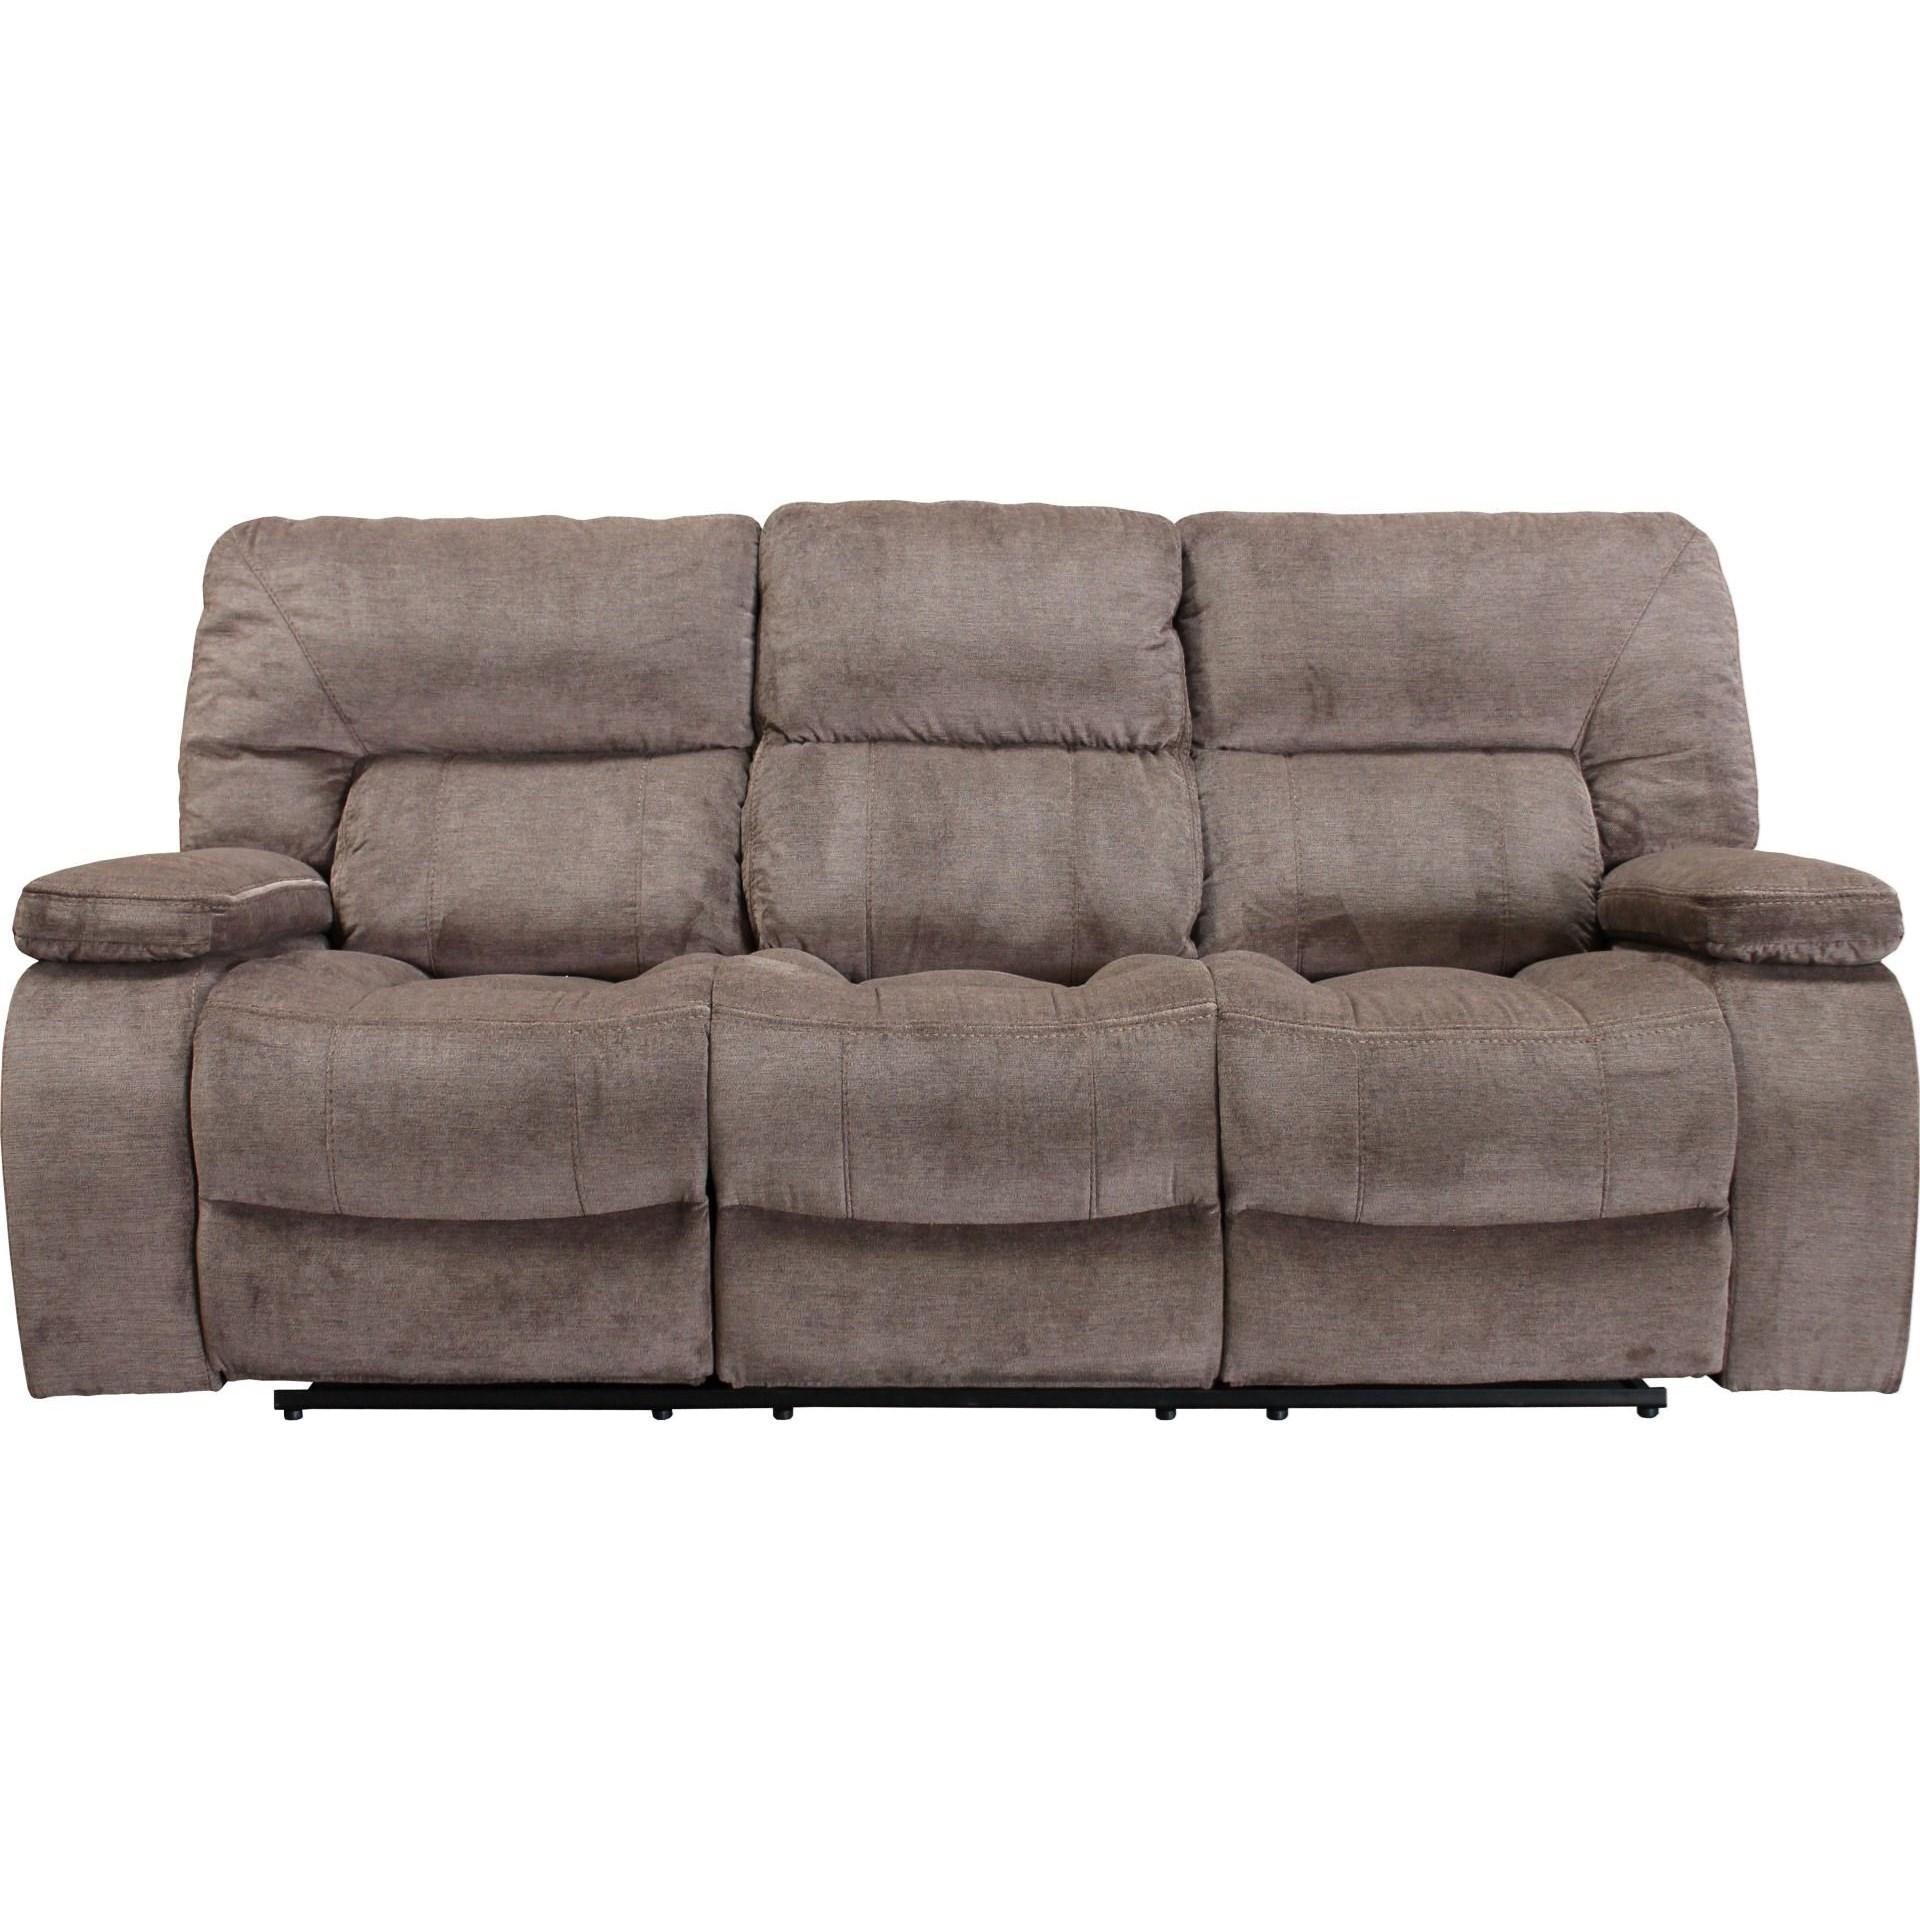 voyager lay flat triple reclining sofa unusual throws for sofas evan walker